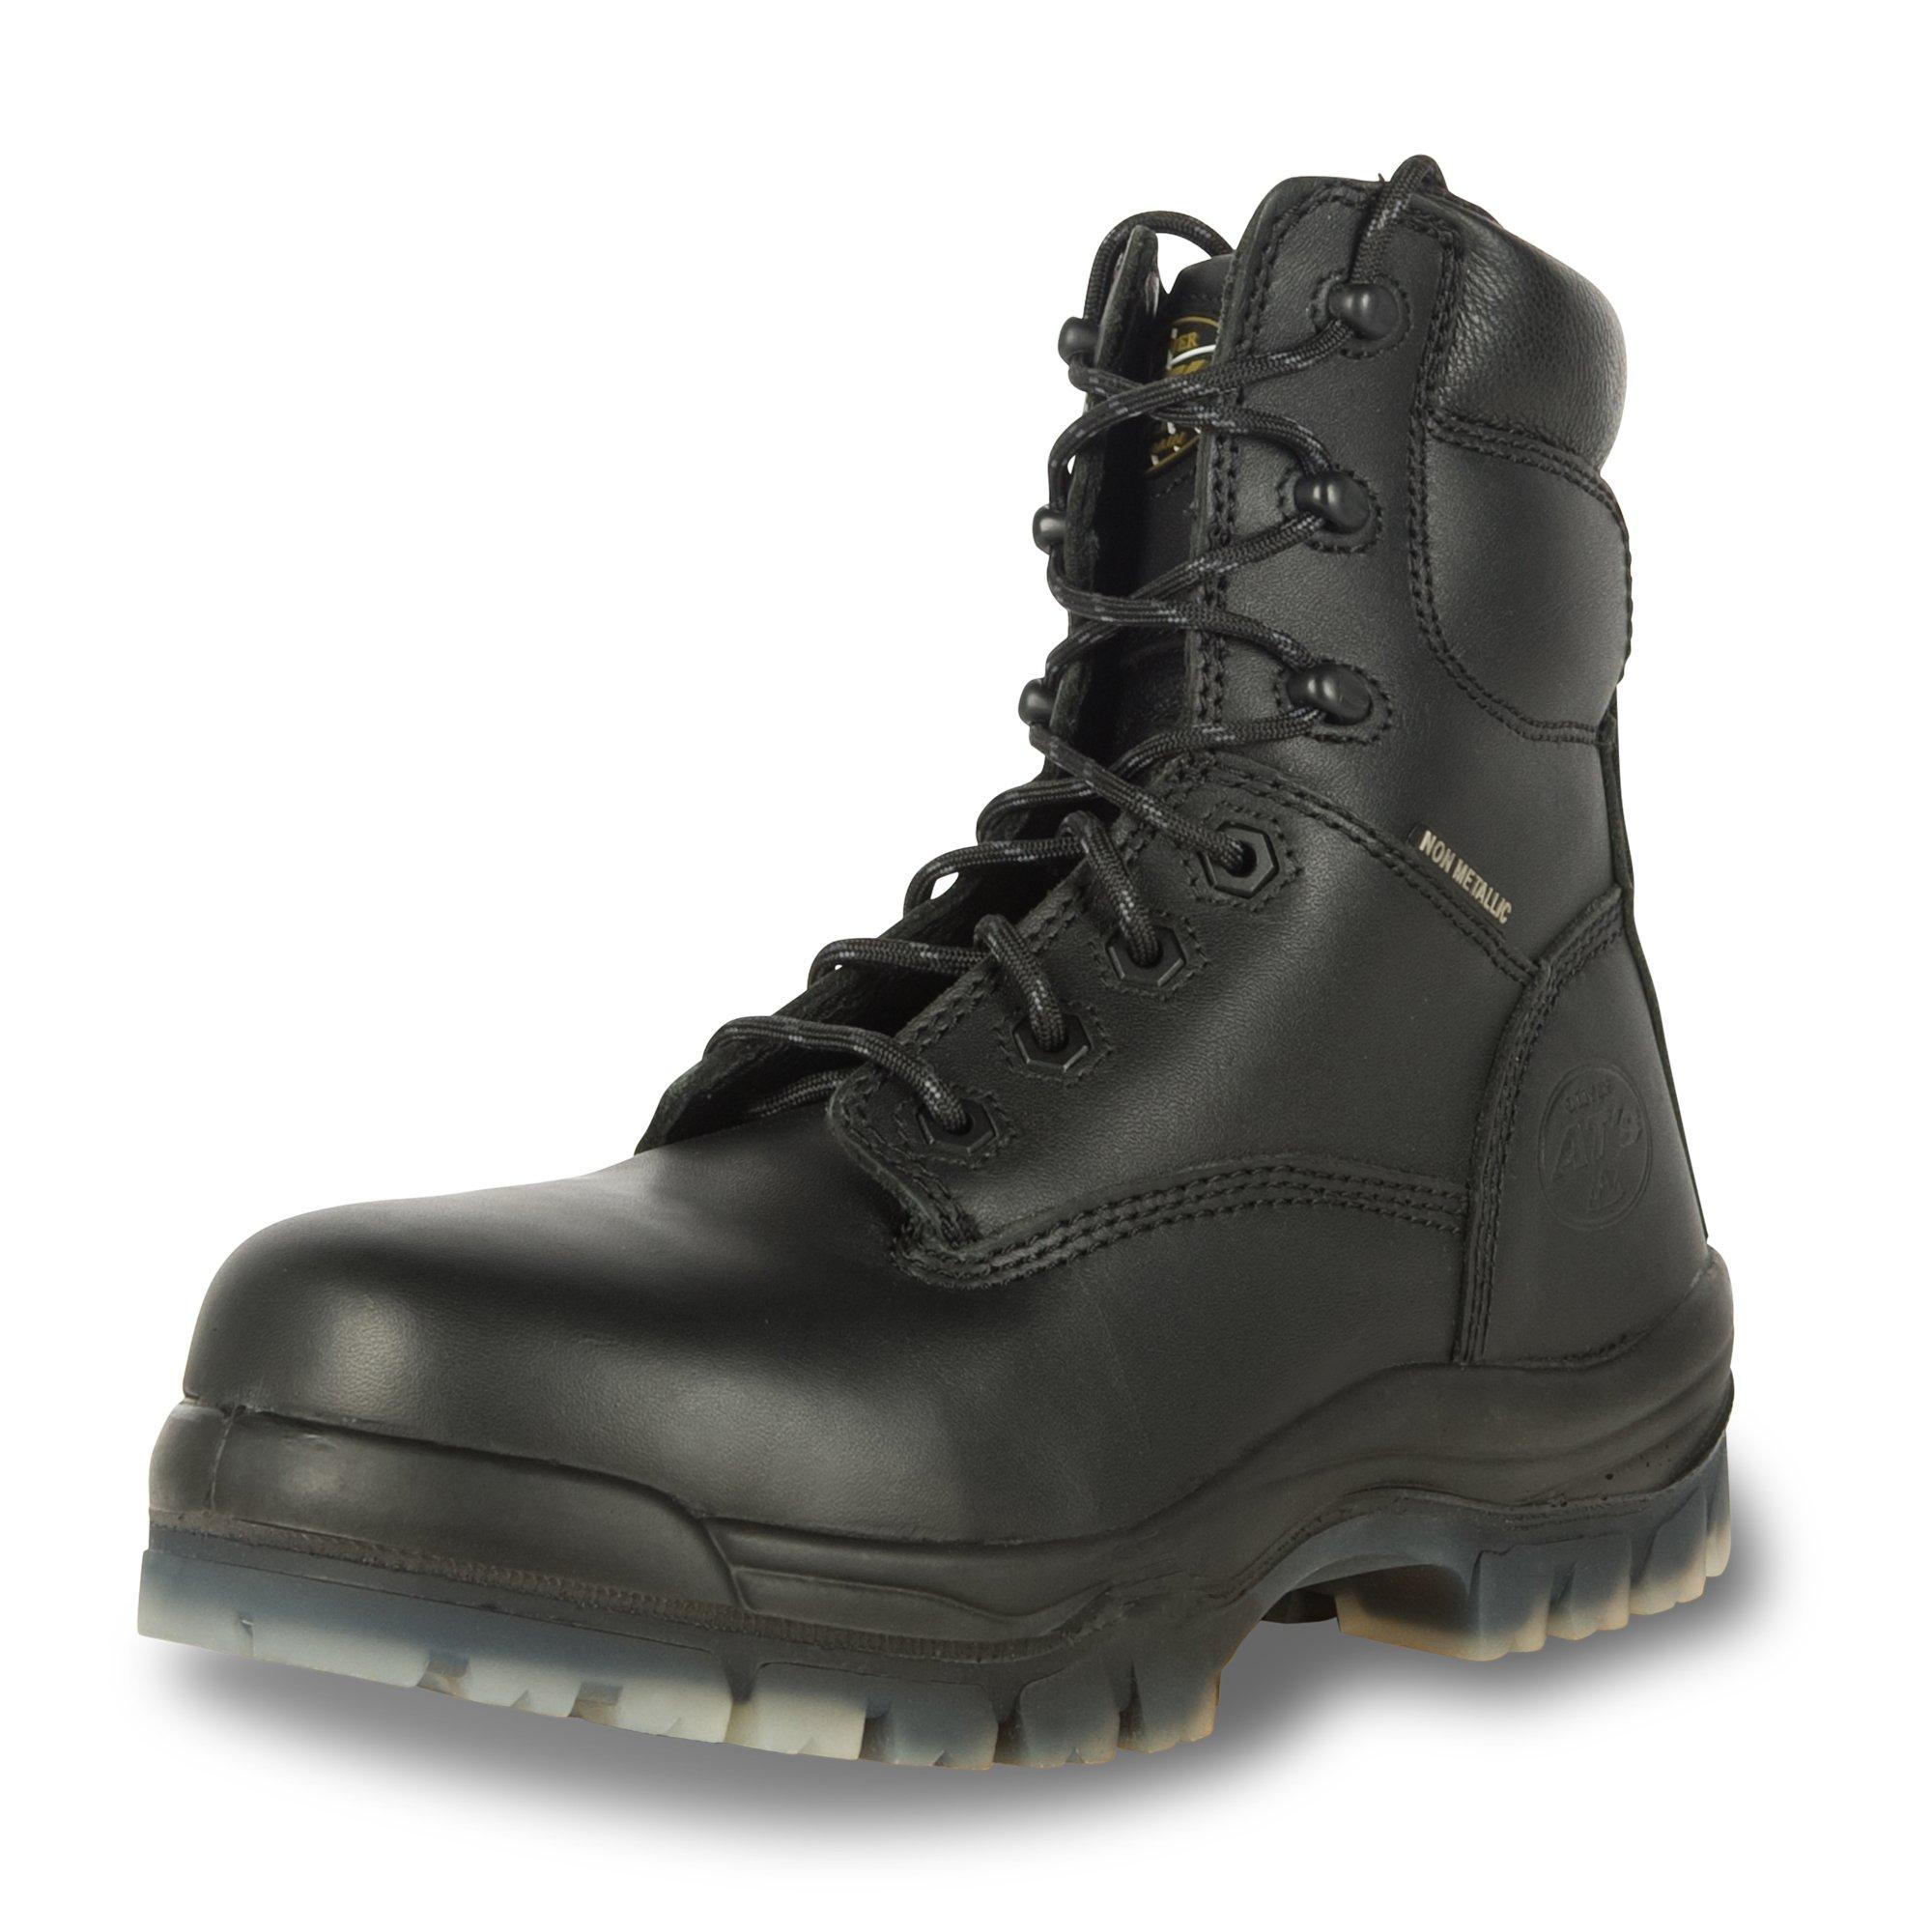 "Oliver 45 Series 6"" Leather Men's Composite Toe"